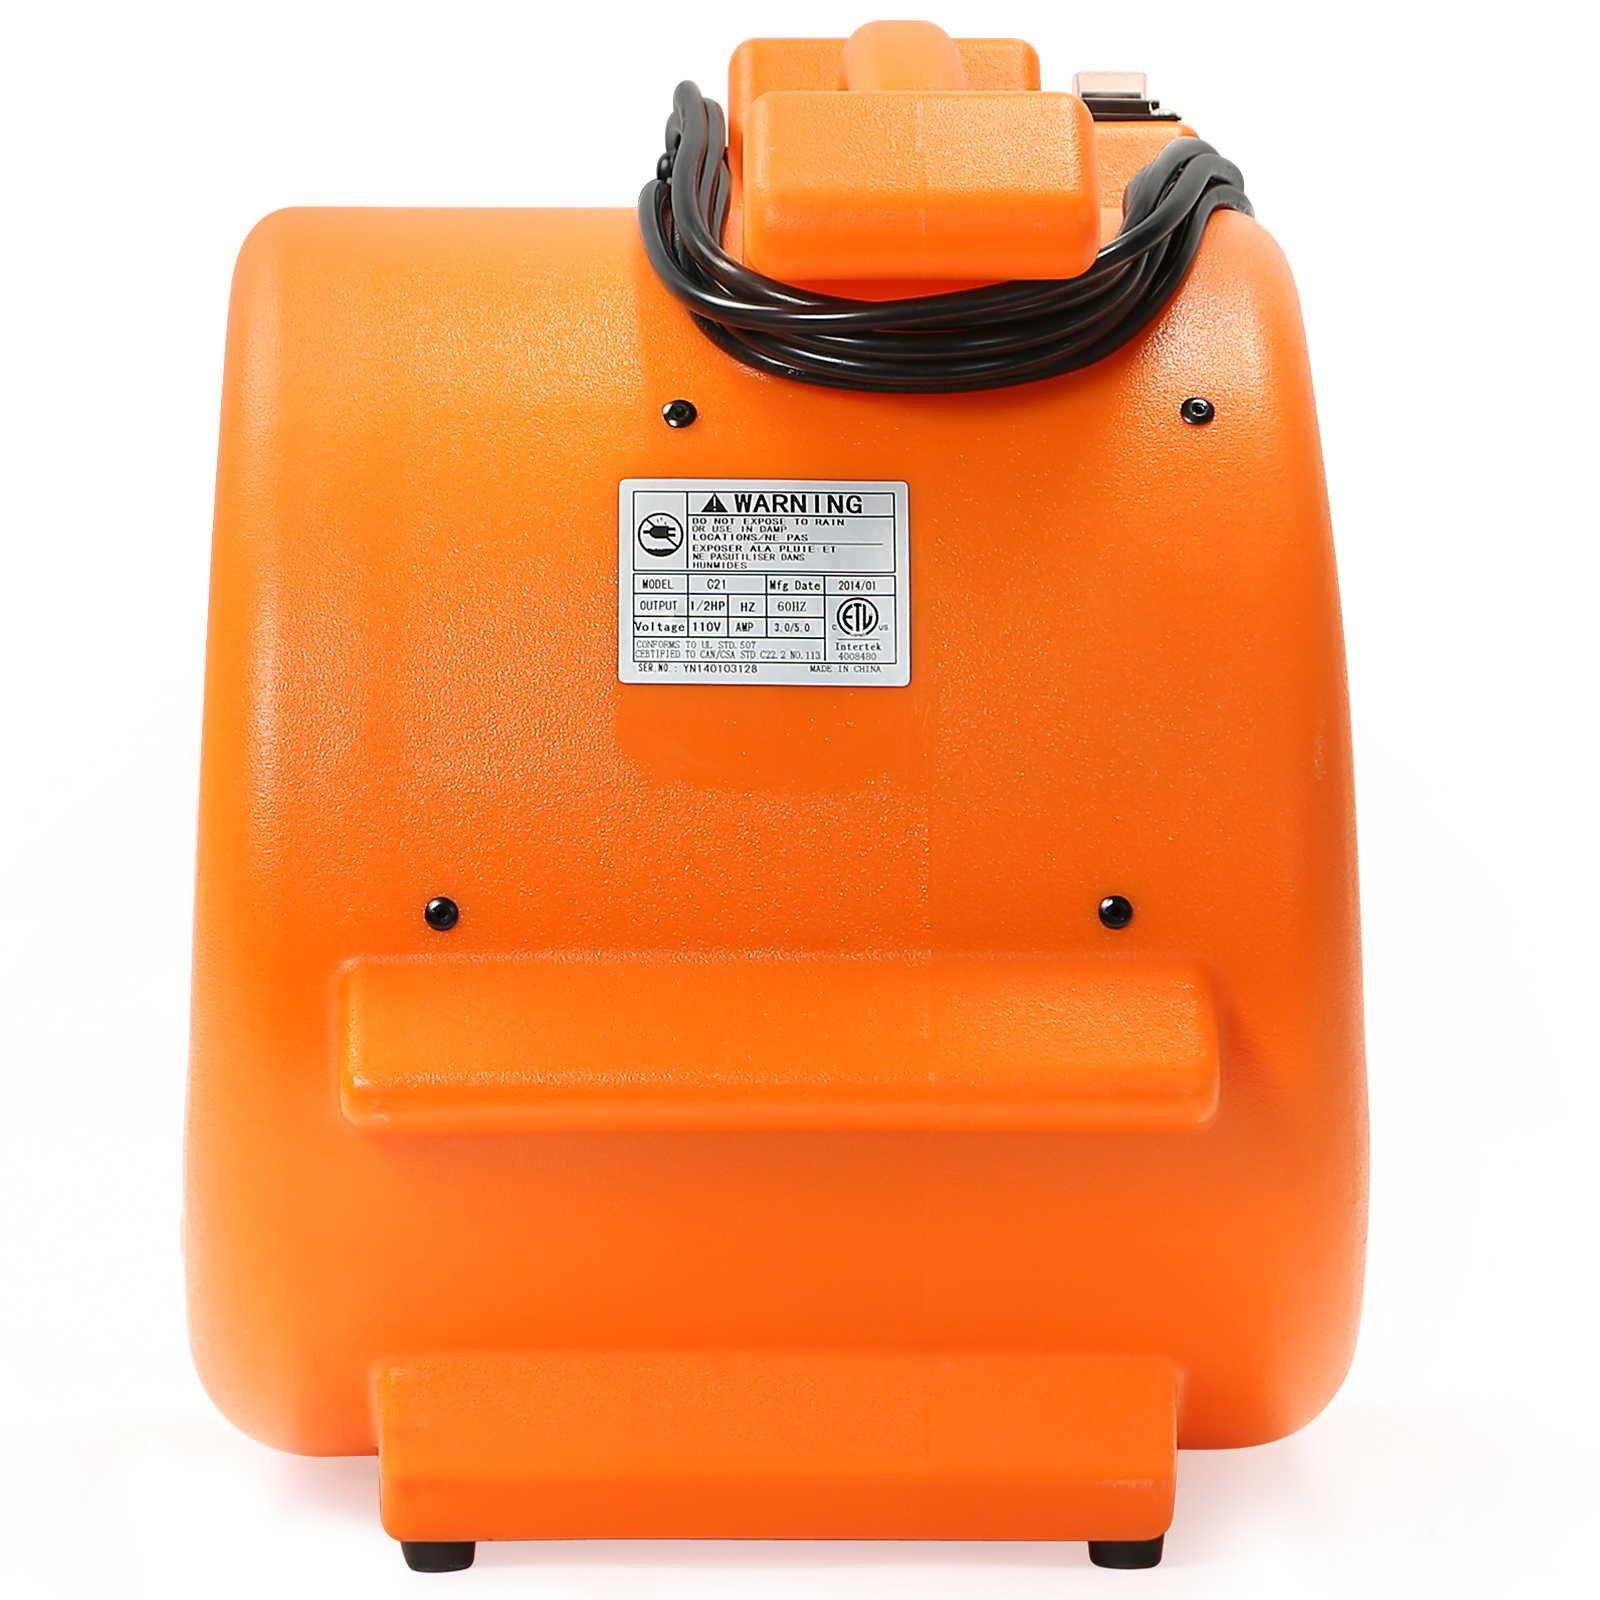 CFM Pro Air Mover Carpet Floor Dryer 2 Speed 1/2 HP Blower Fan - Orange - Industrial Water Flood Damage Restoration by CFM Pro (Image #6)